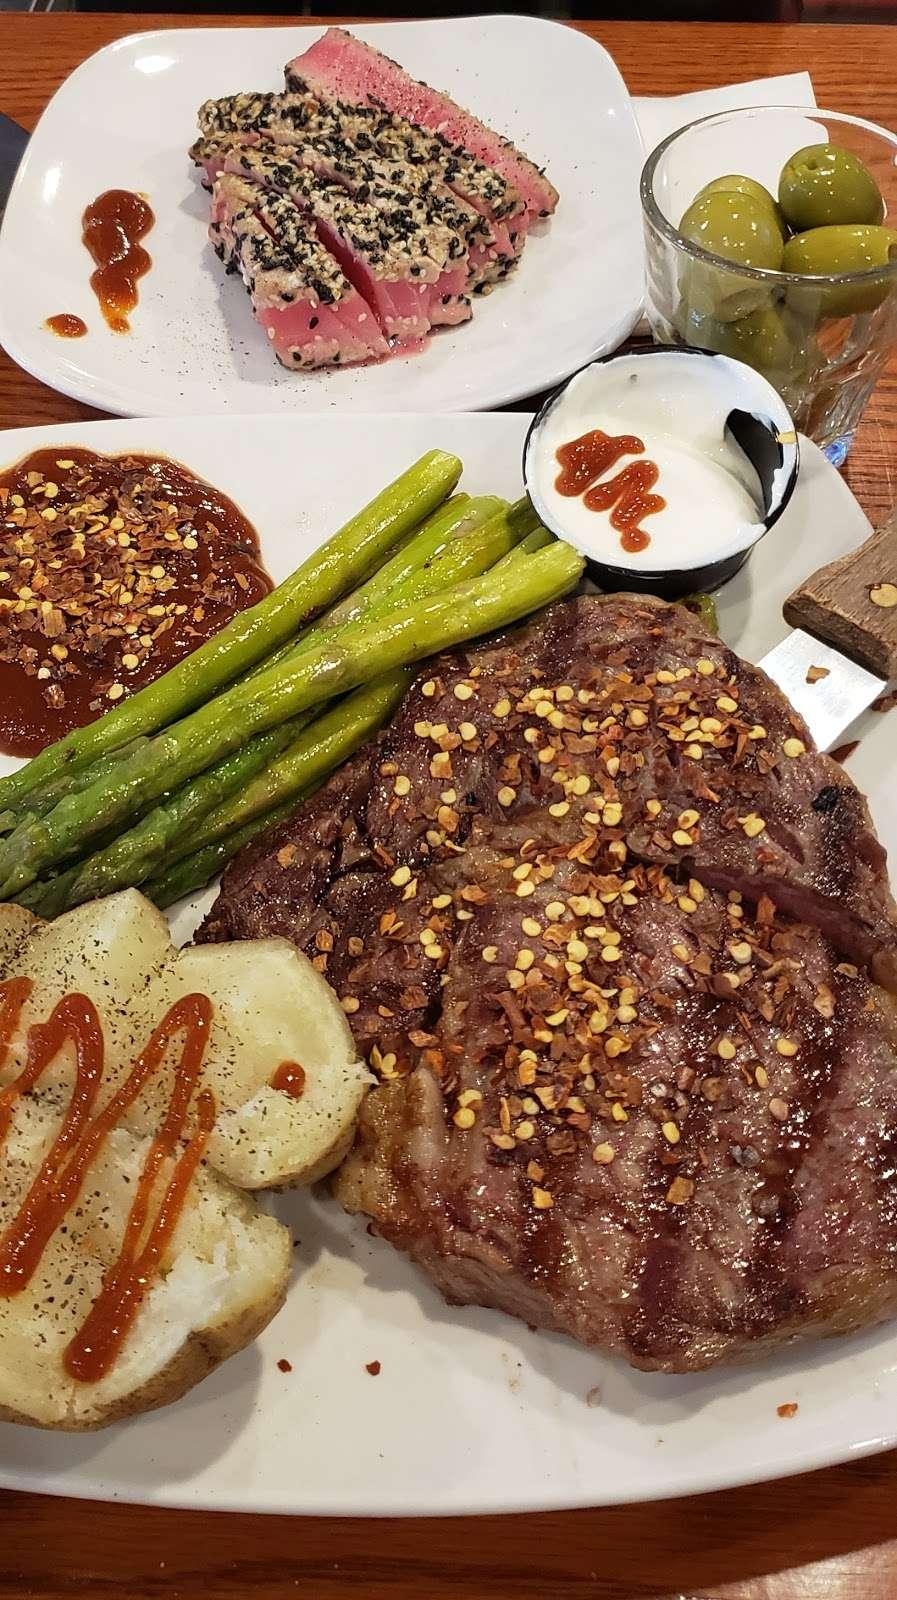 Dooneys Pub Delran - restaurant  | Photo 6 of 10 | Address: 1361 Fairview Blvd, Delran, NJ 08075, USA | Phone: (856) 461-9100